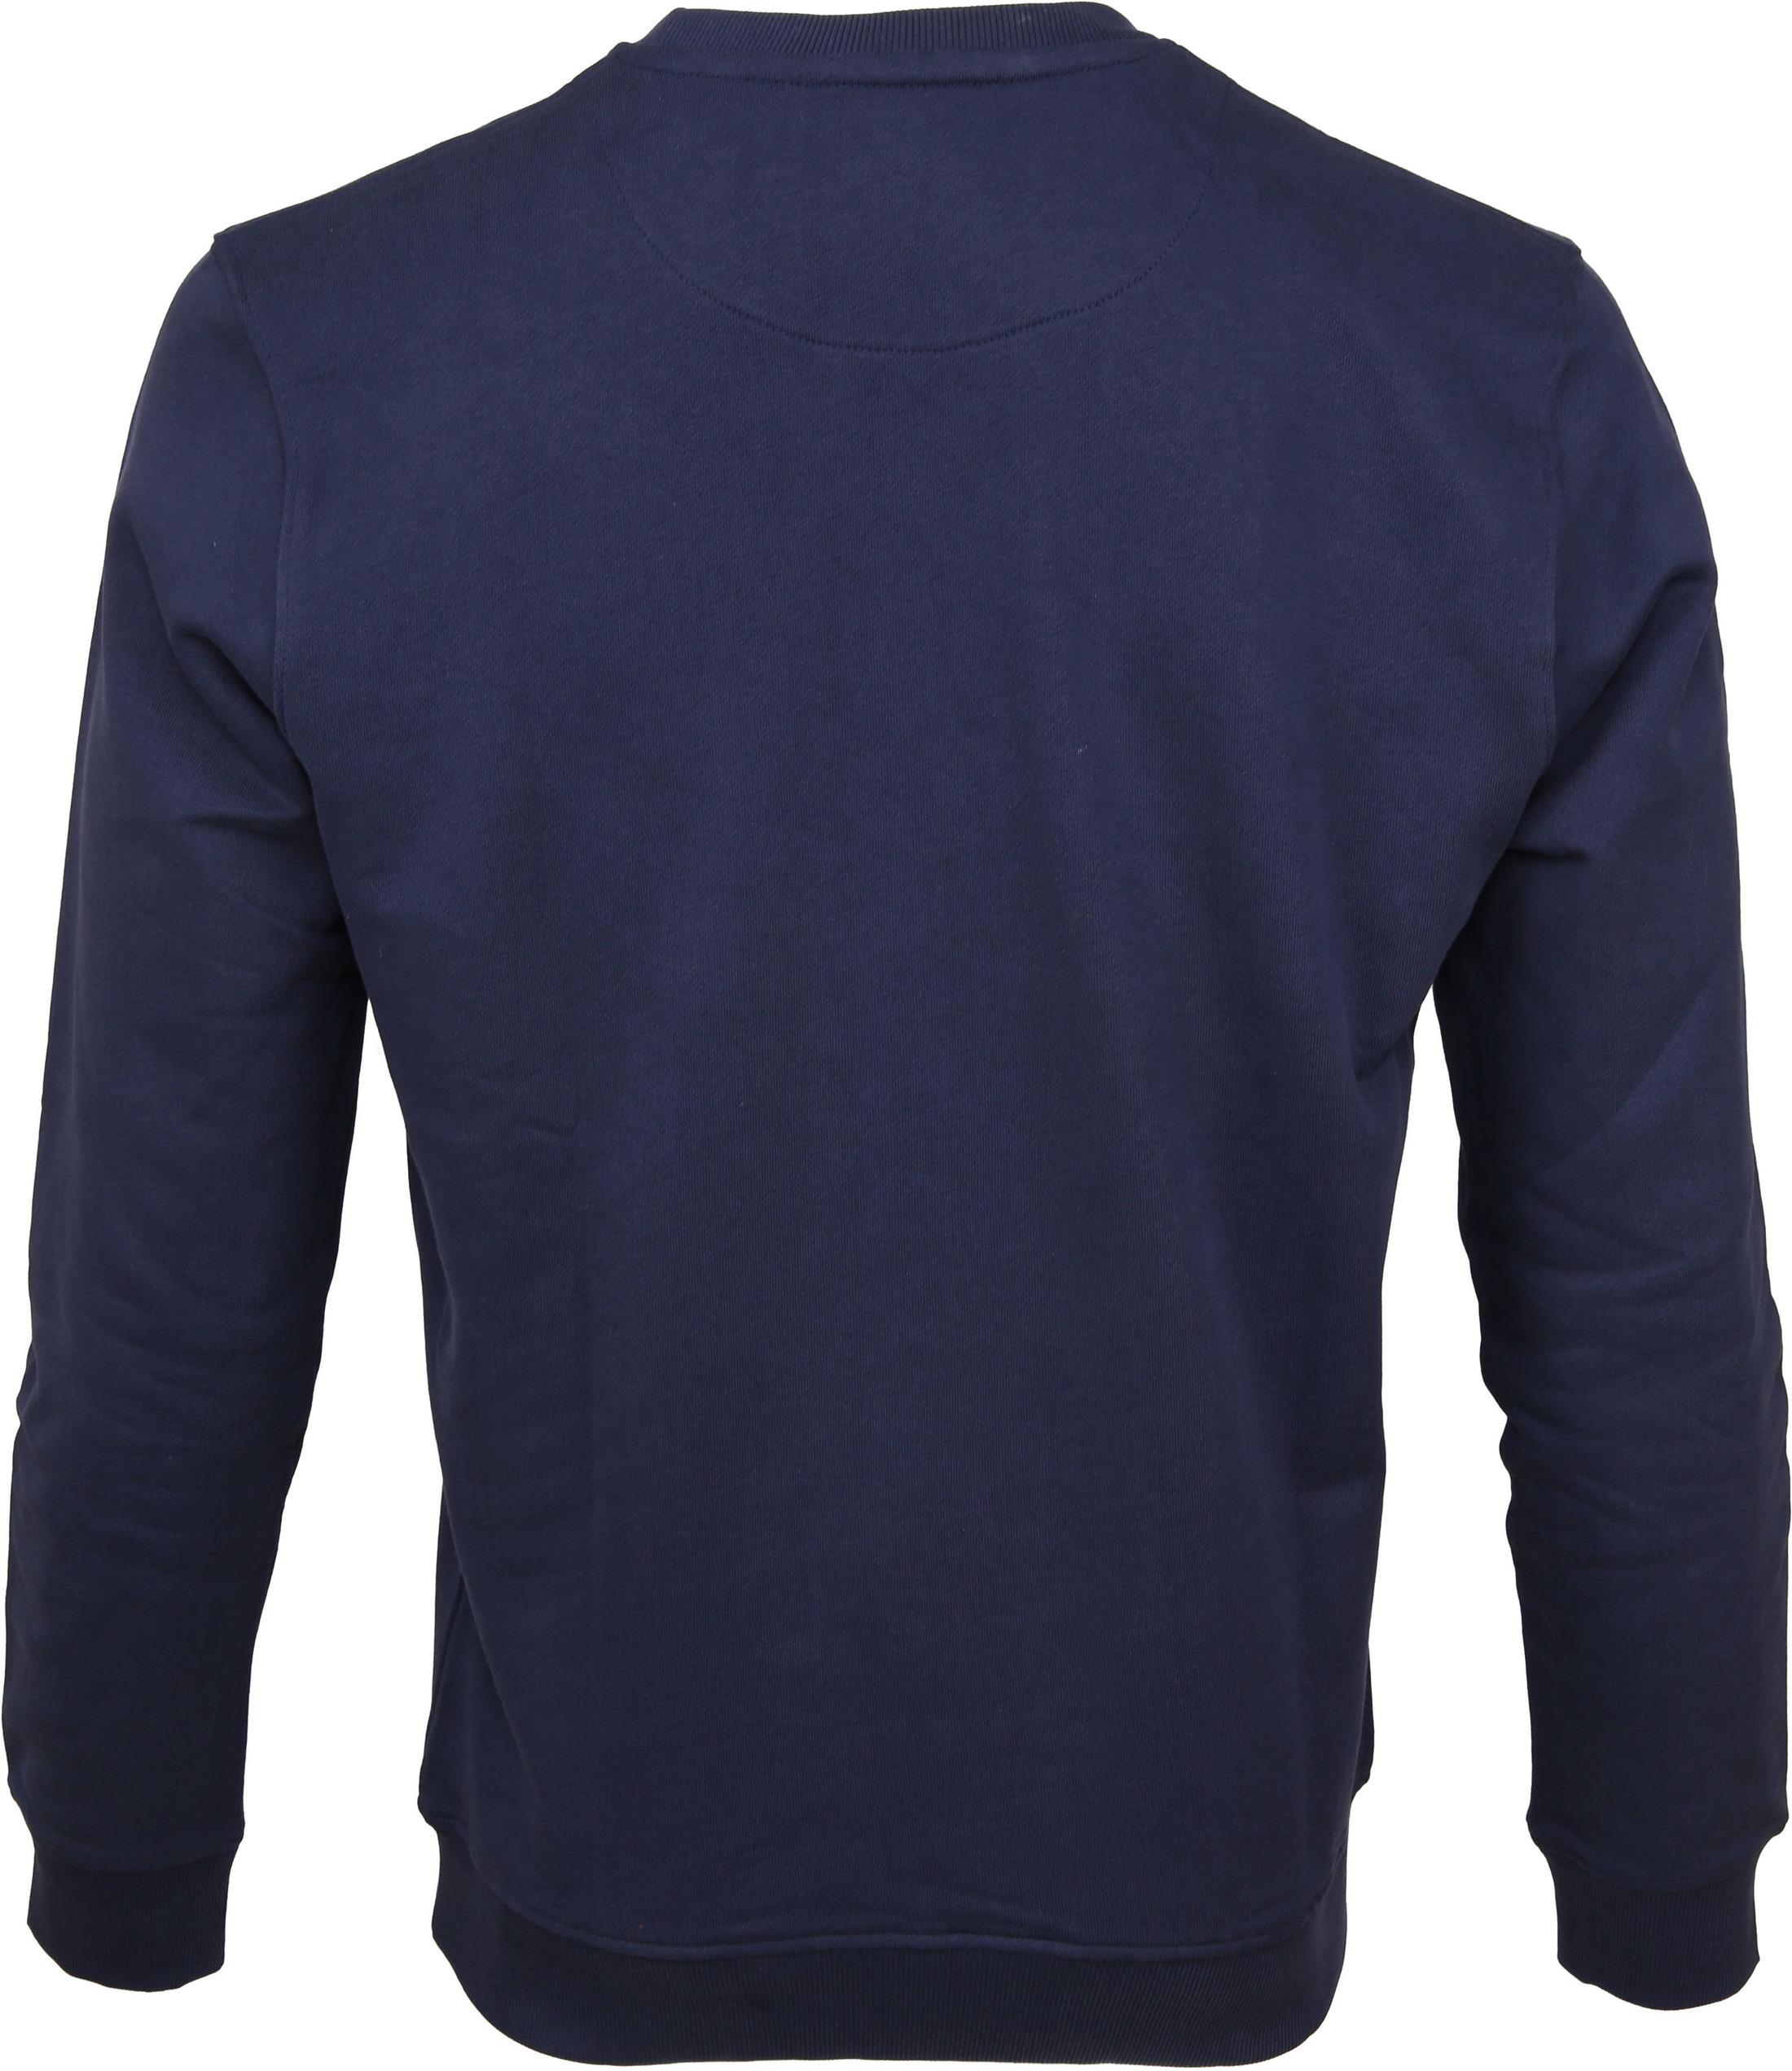 Suitable Sweater Space Dunkelblau foto 2